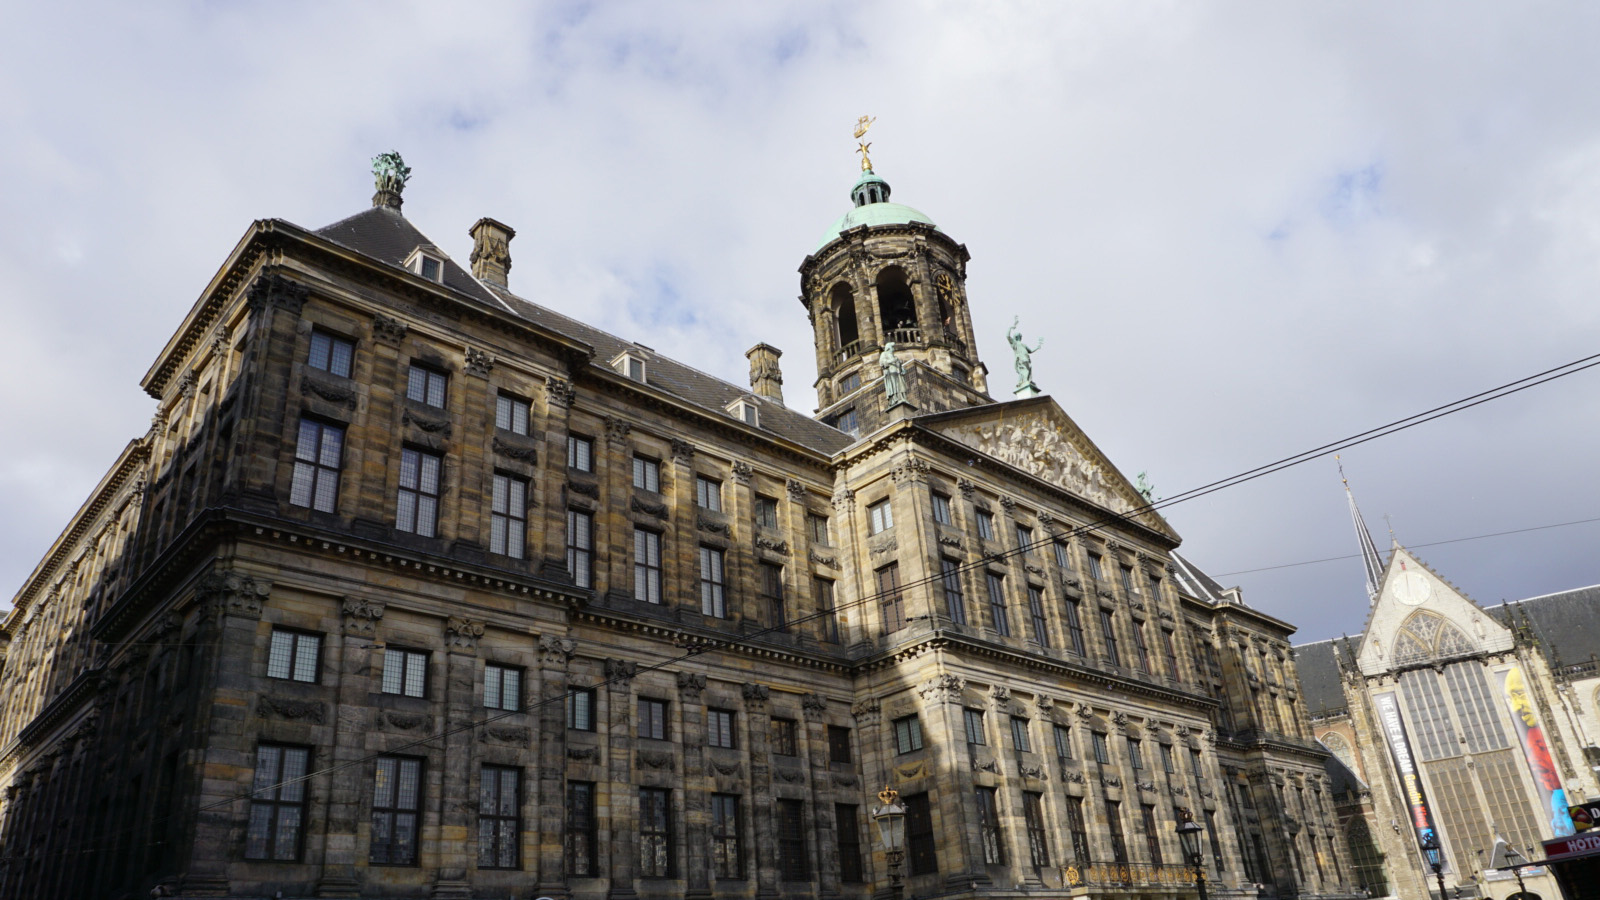 stadhuis-royal-palace-amsterdam-miniaturist